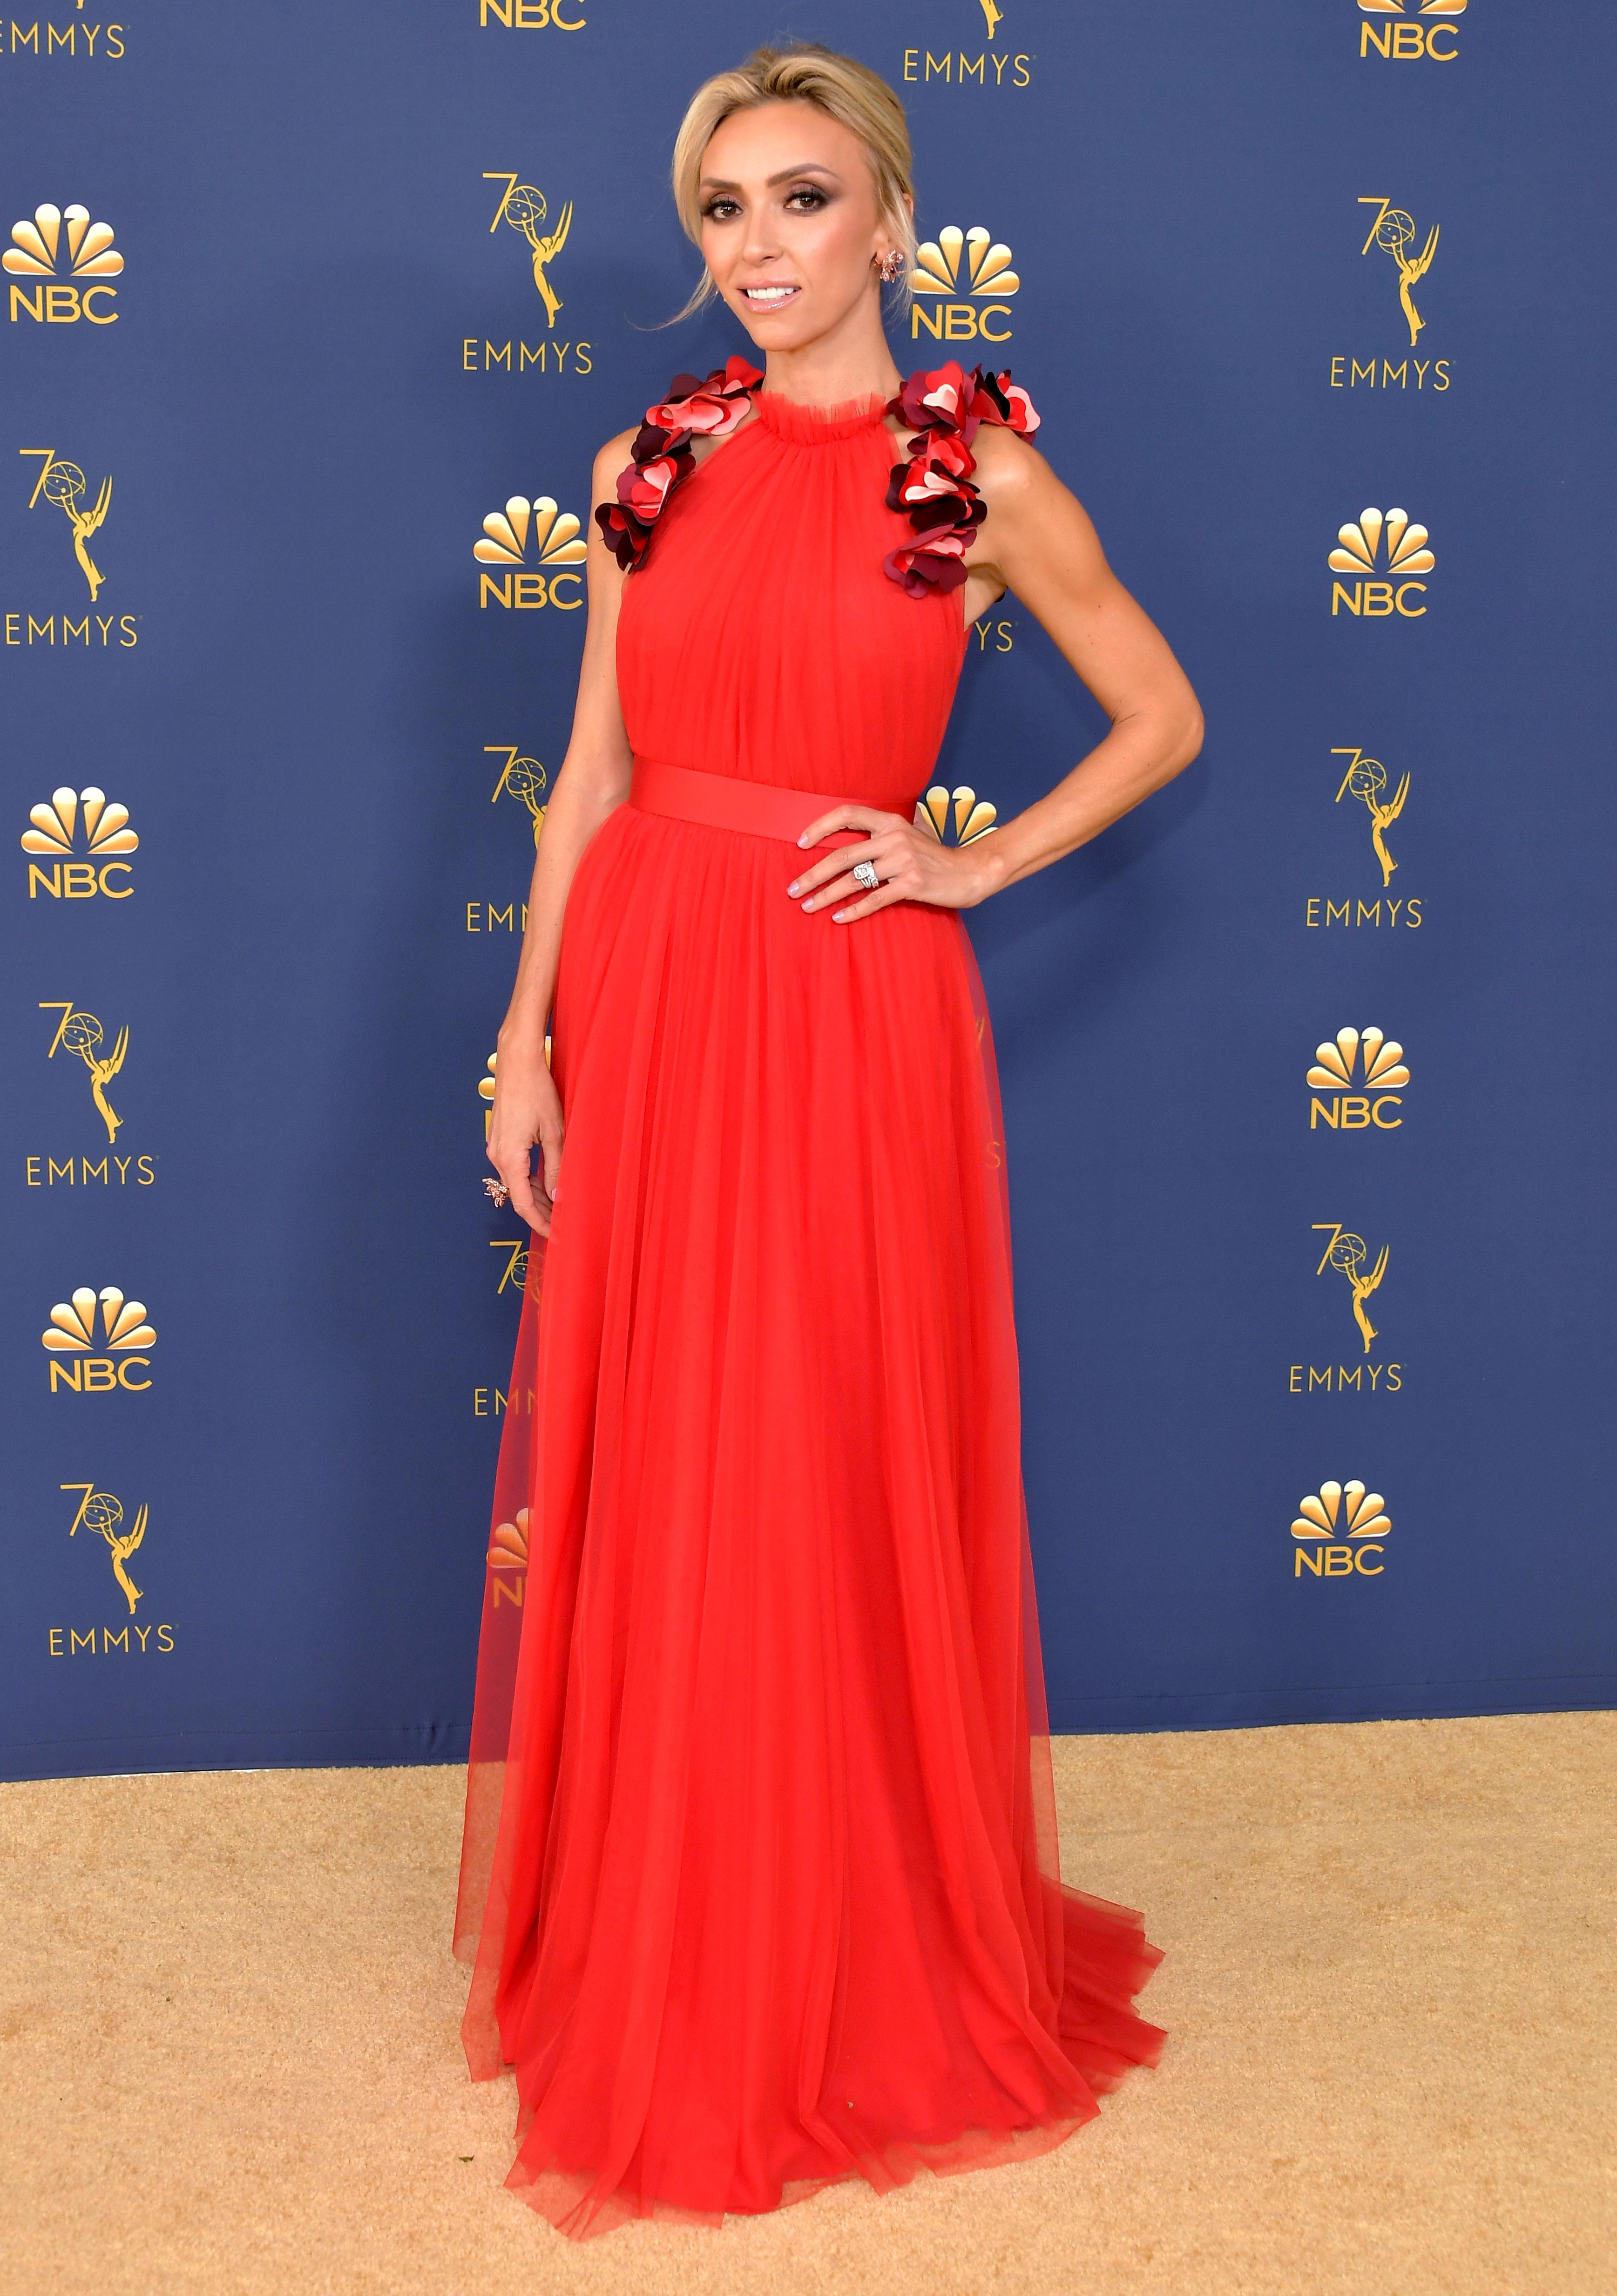 61d8061fae Emmys 2018 Red Carpet Fashion  See Celeb Dresses